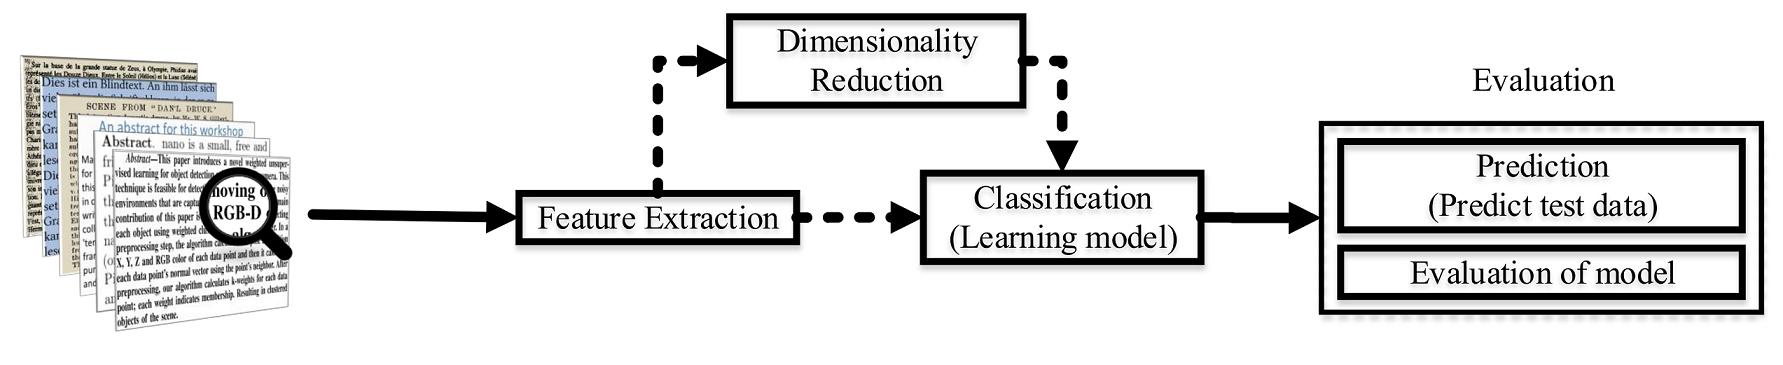 docs/pic/OverviewTextClassification.png